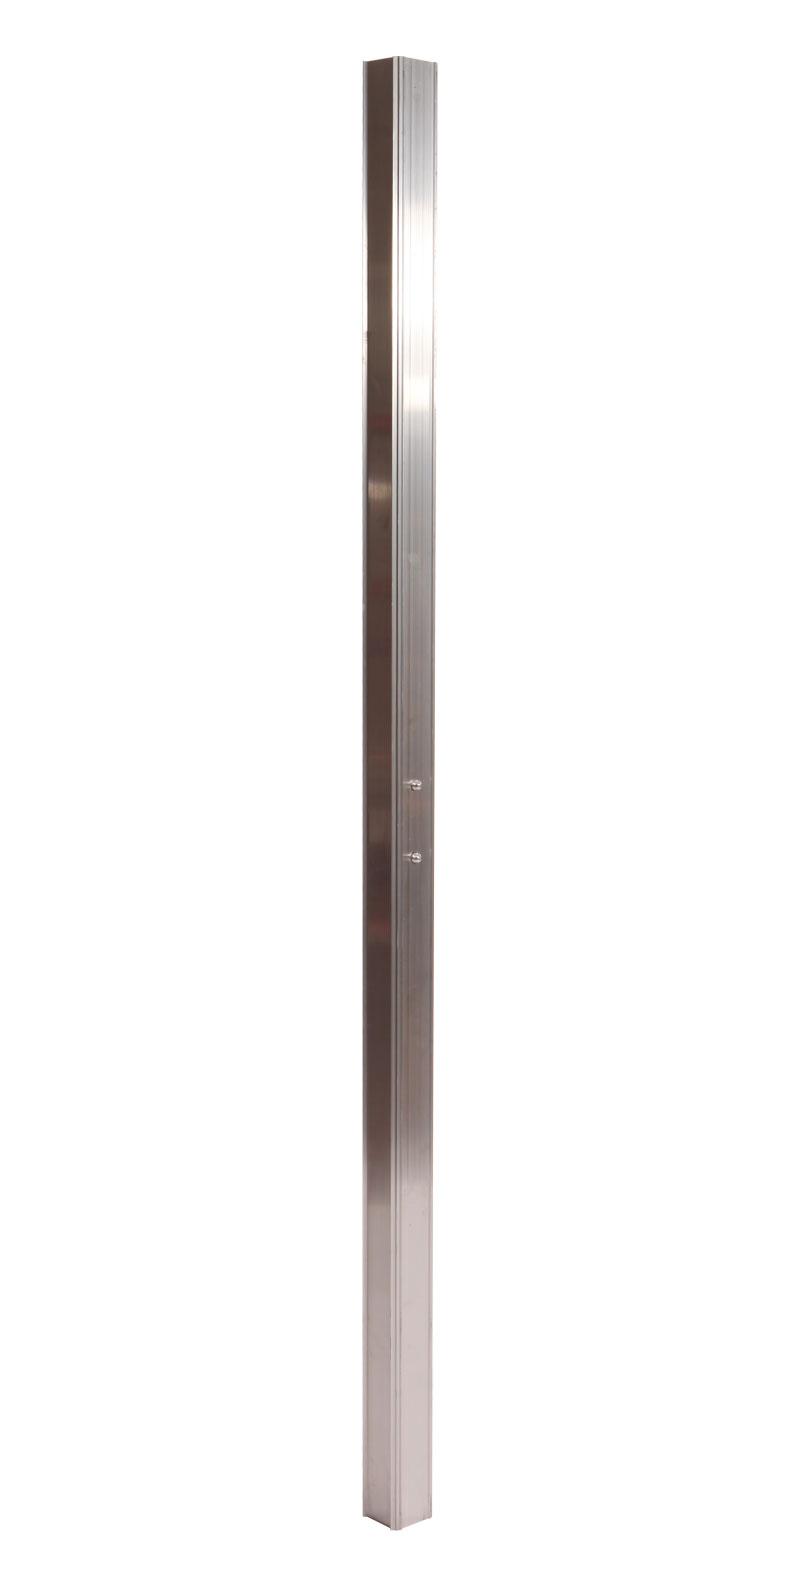 6 ft. Aluminum Pump Jack Insert